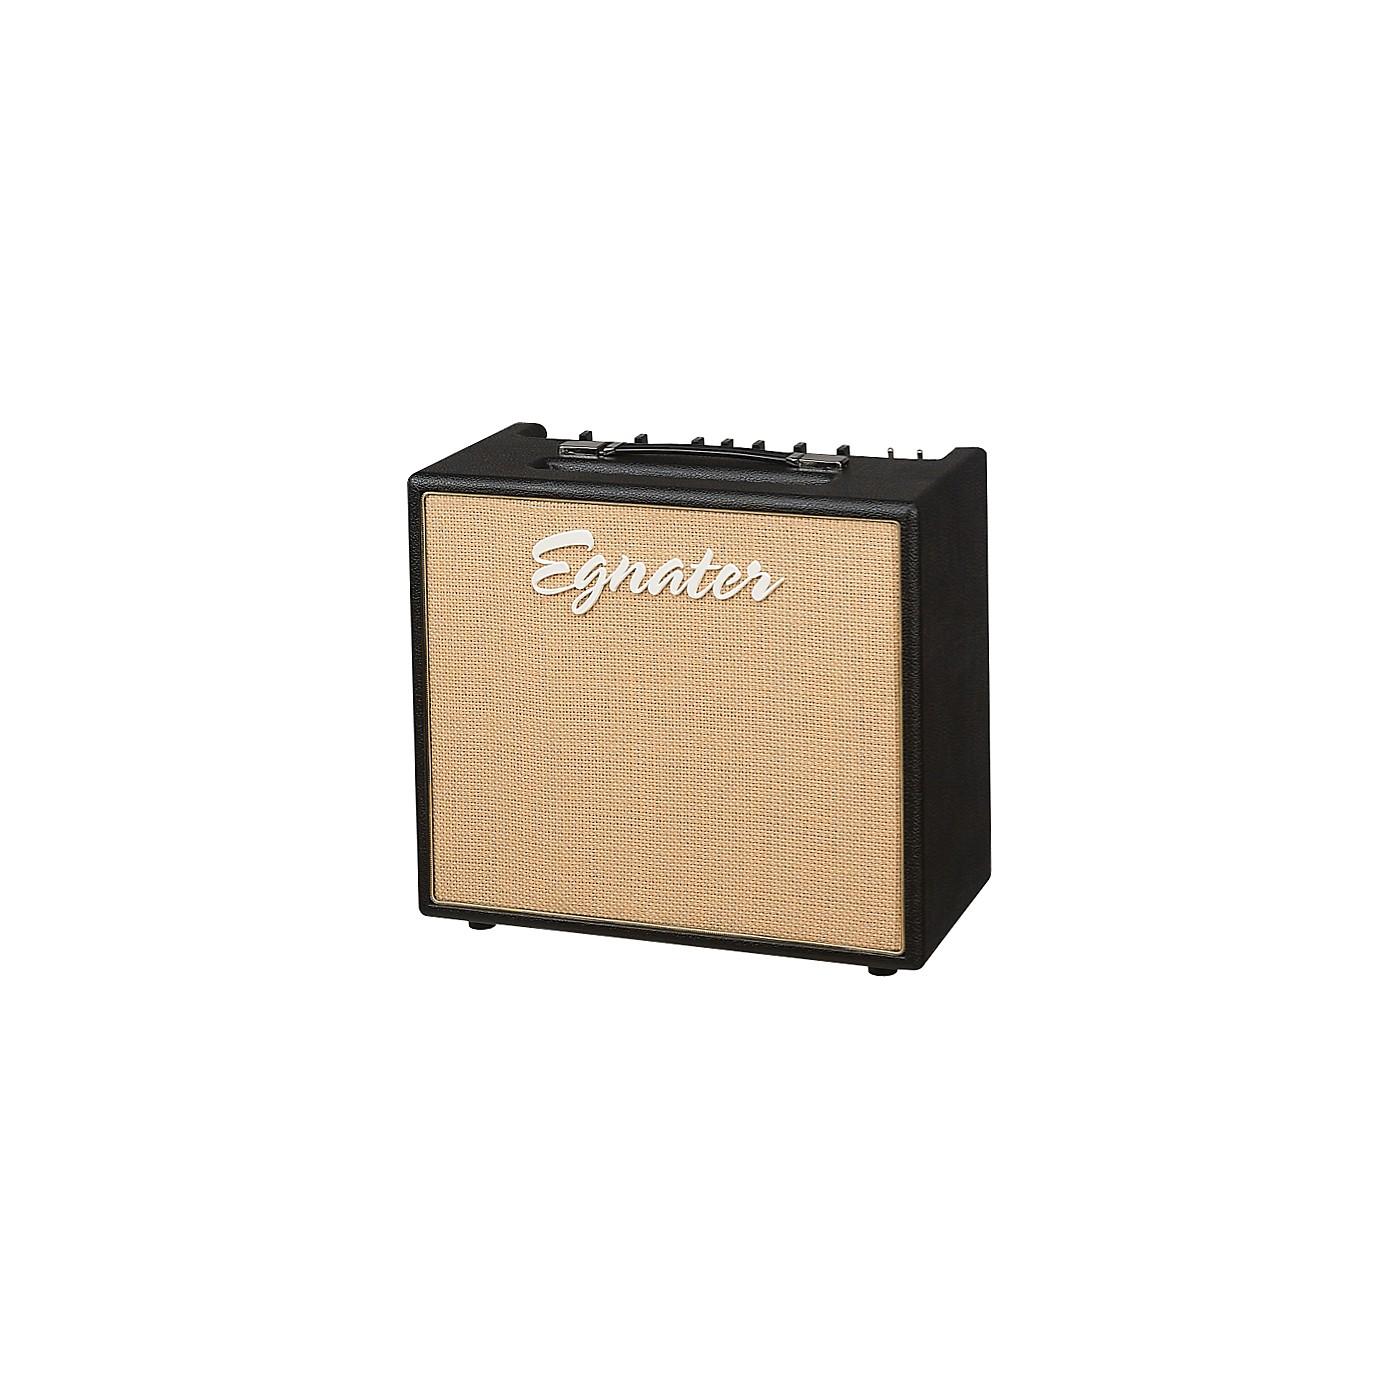 Egnater Tweaker-40 112 40W 1x12 Tube Guitar Combo Amp thumbnail